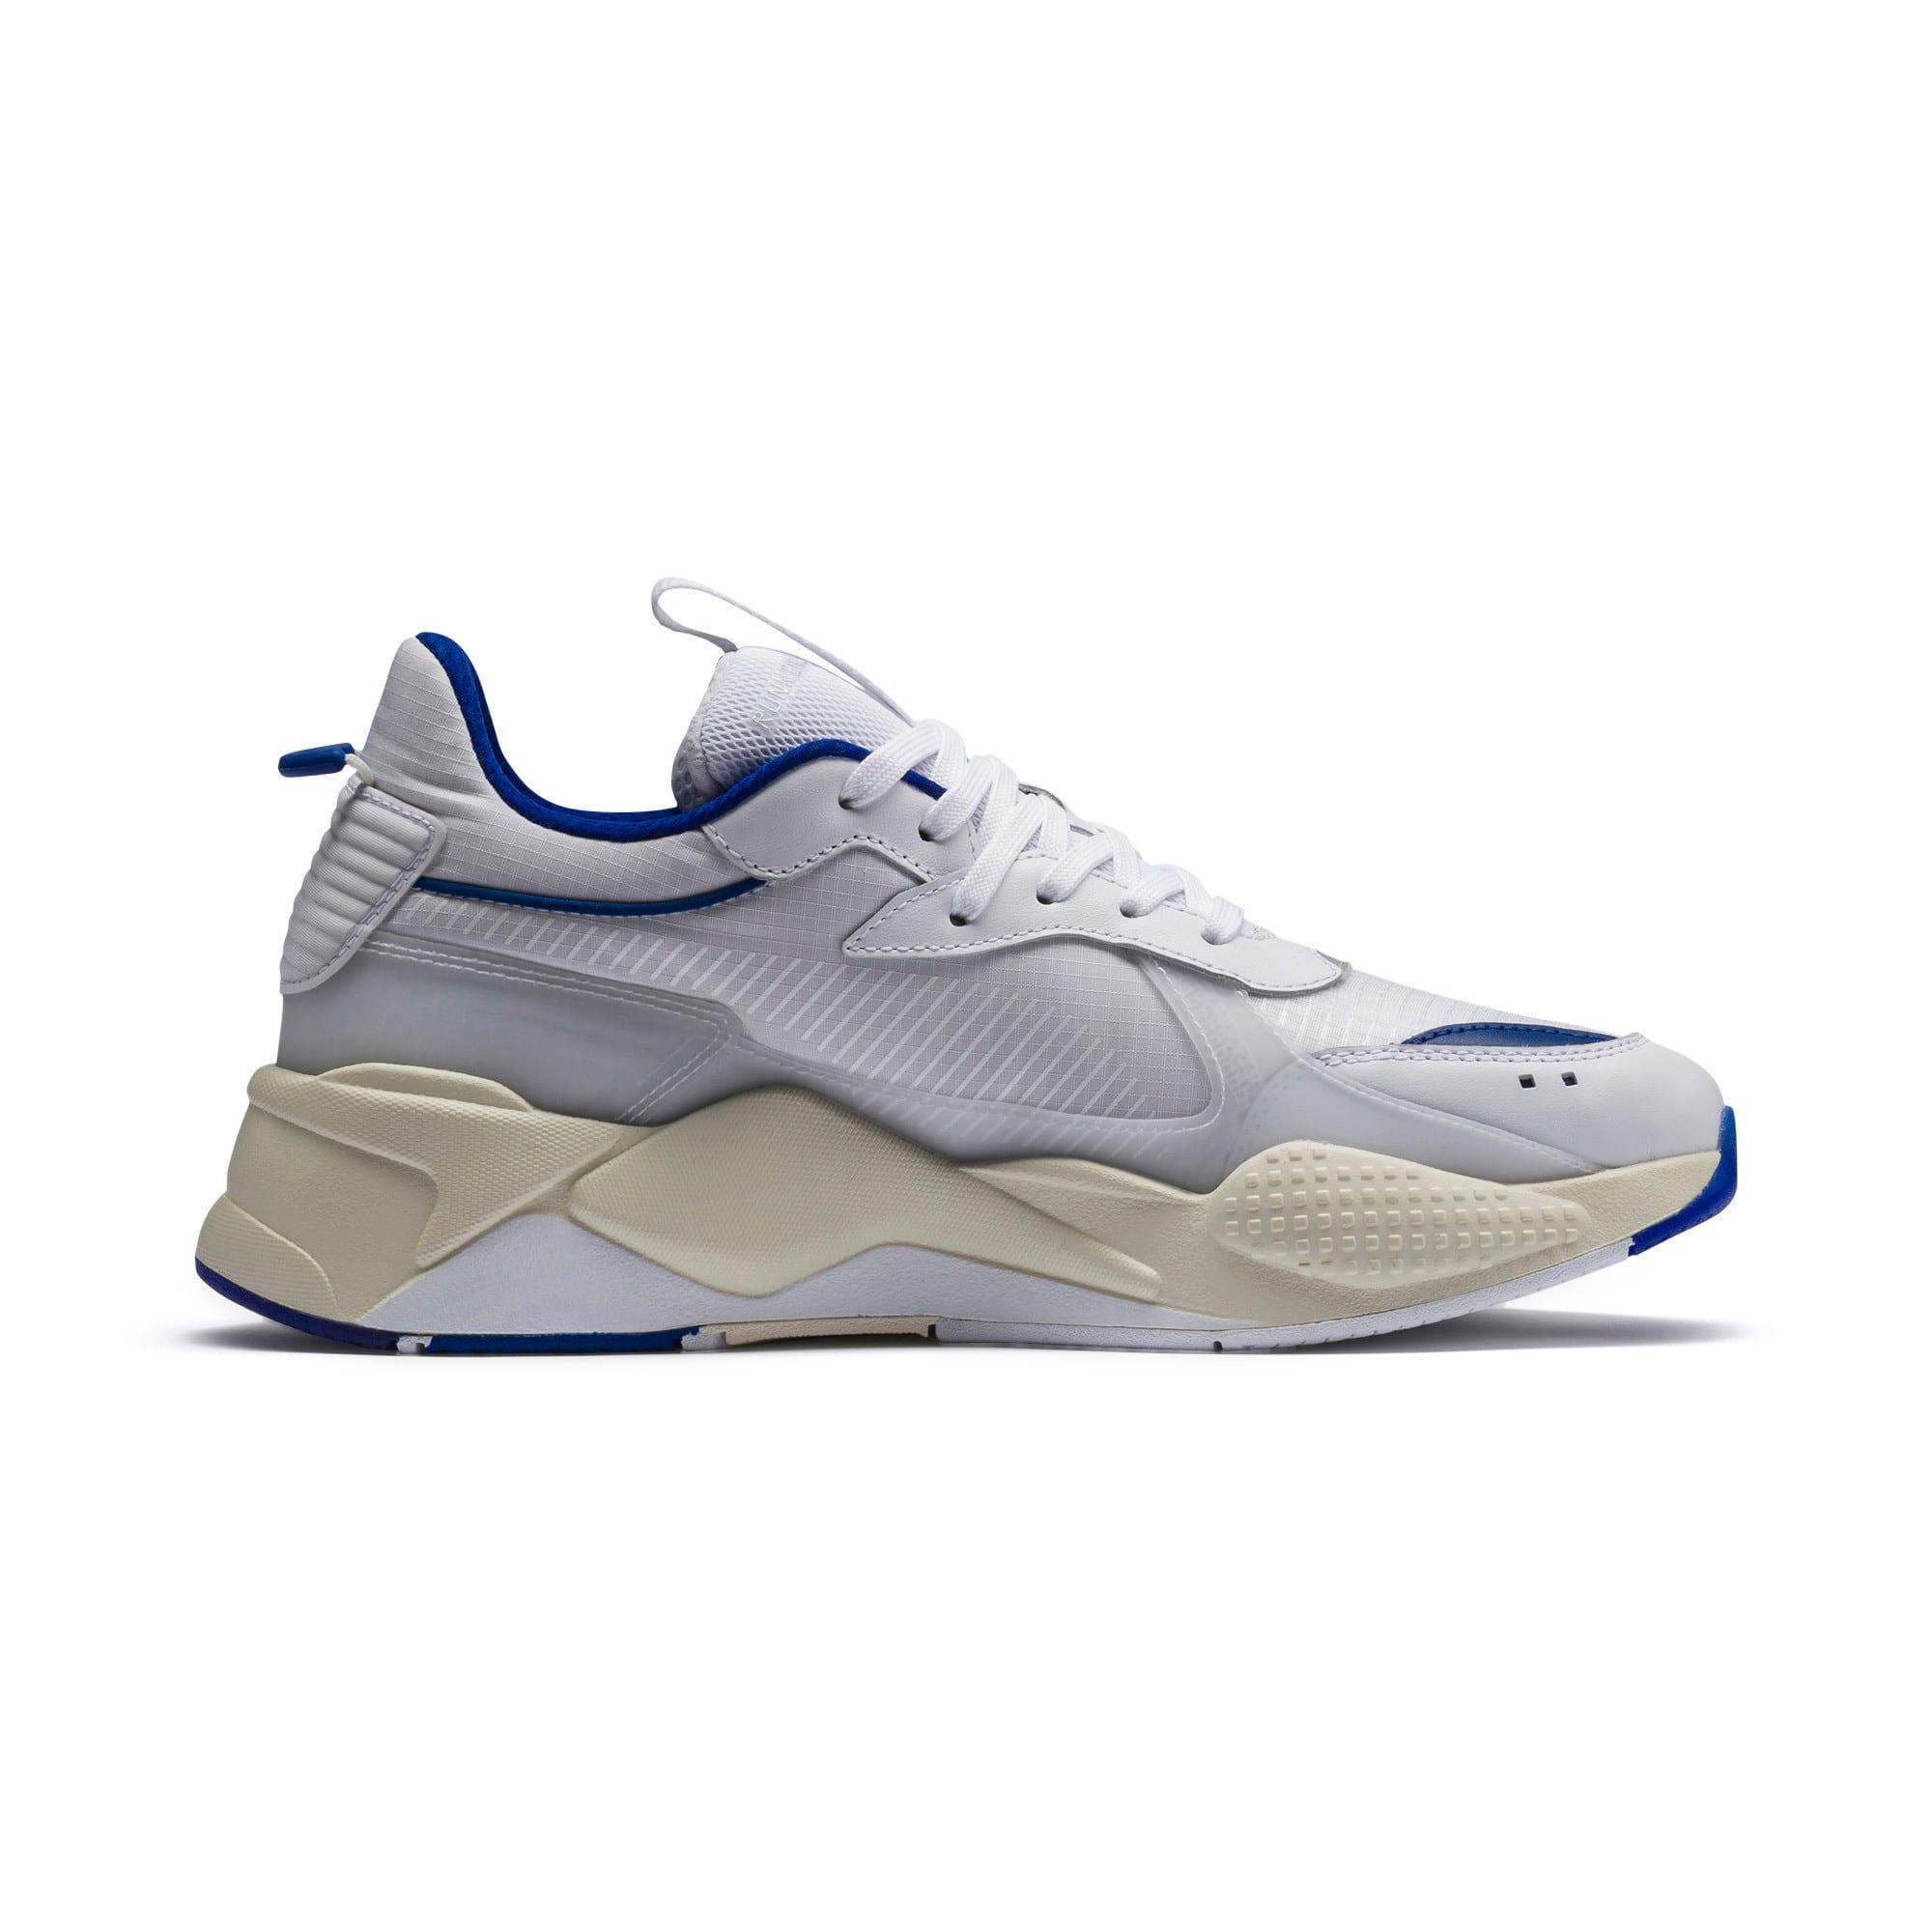 Thumbnail 6 of RS-X Tech Sneaker, Puma White-Whisper White, medium